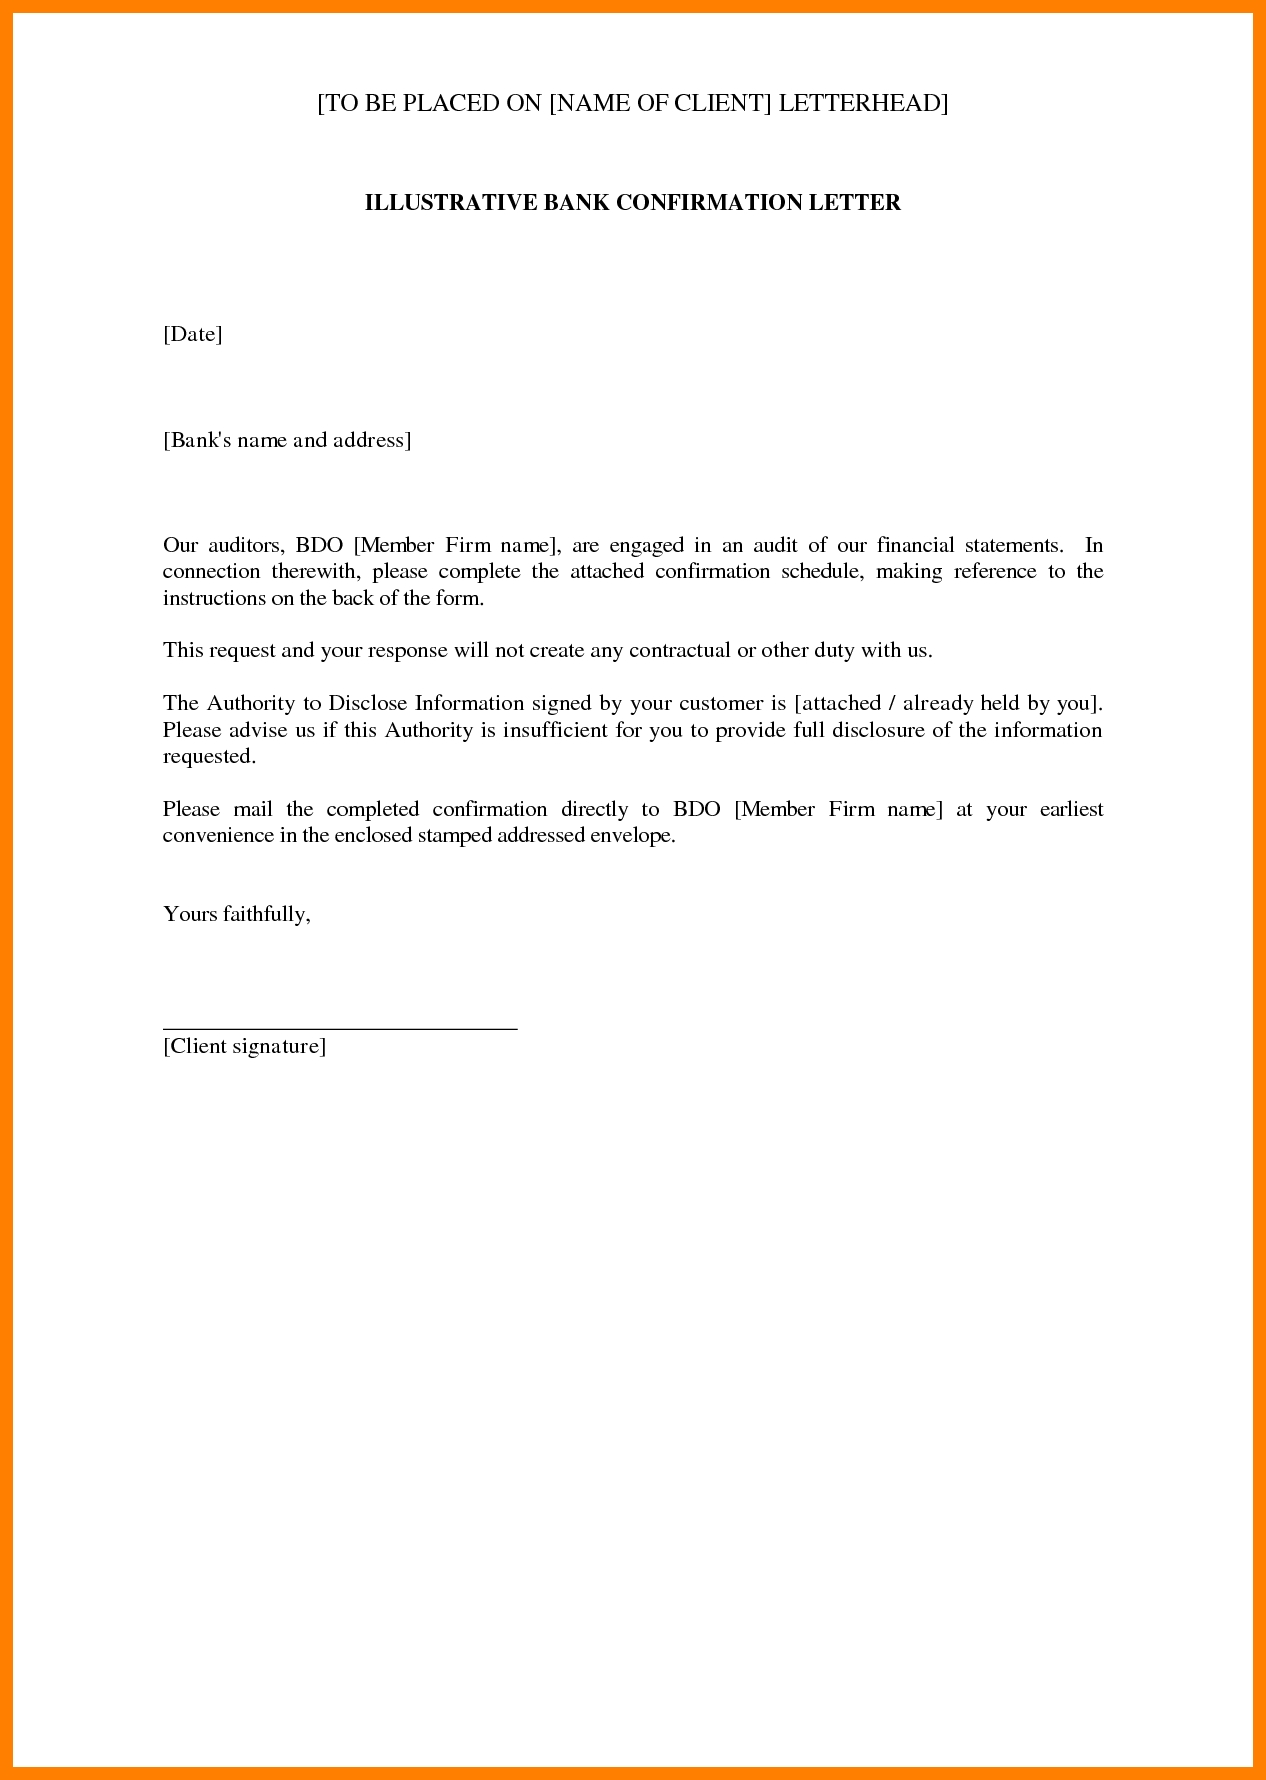 Bank Account Confirmation Letter Commerce Invoice Sample | Banks intended for Letter For Food Stamps Sample